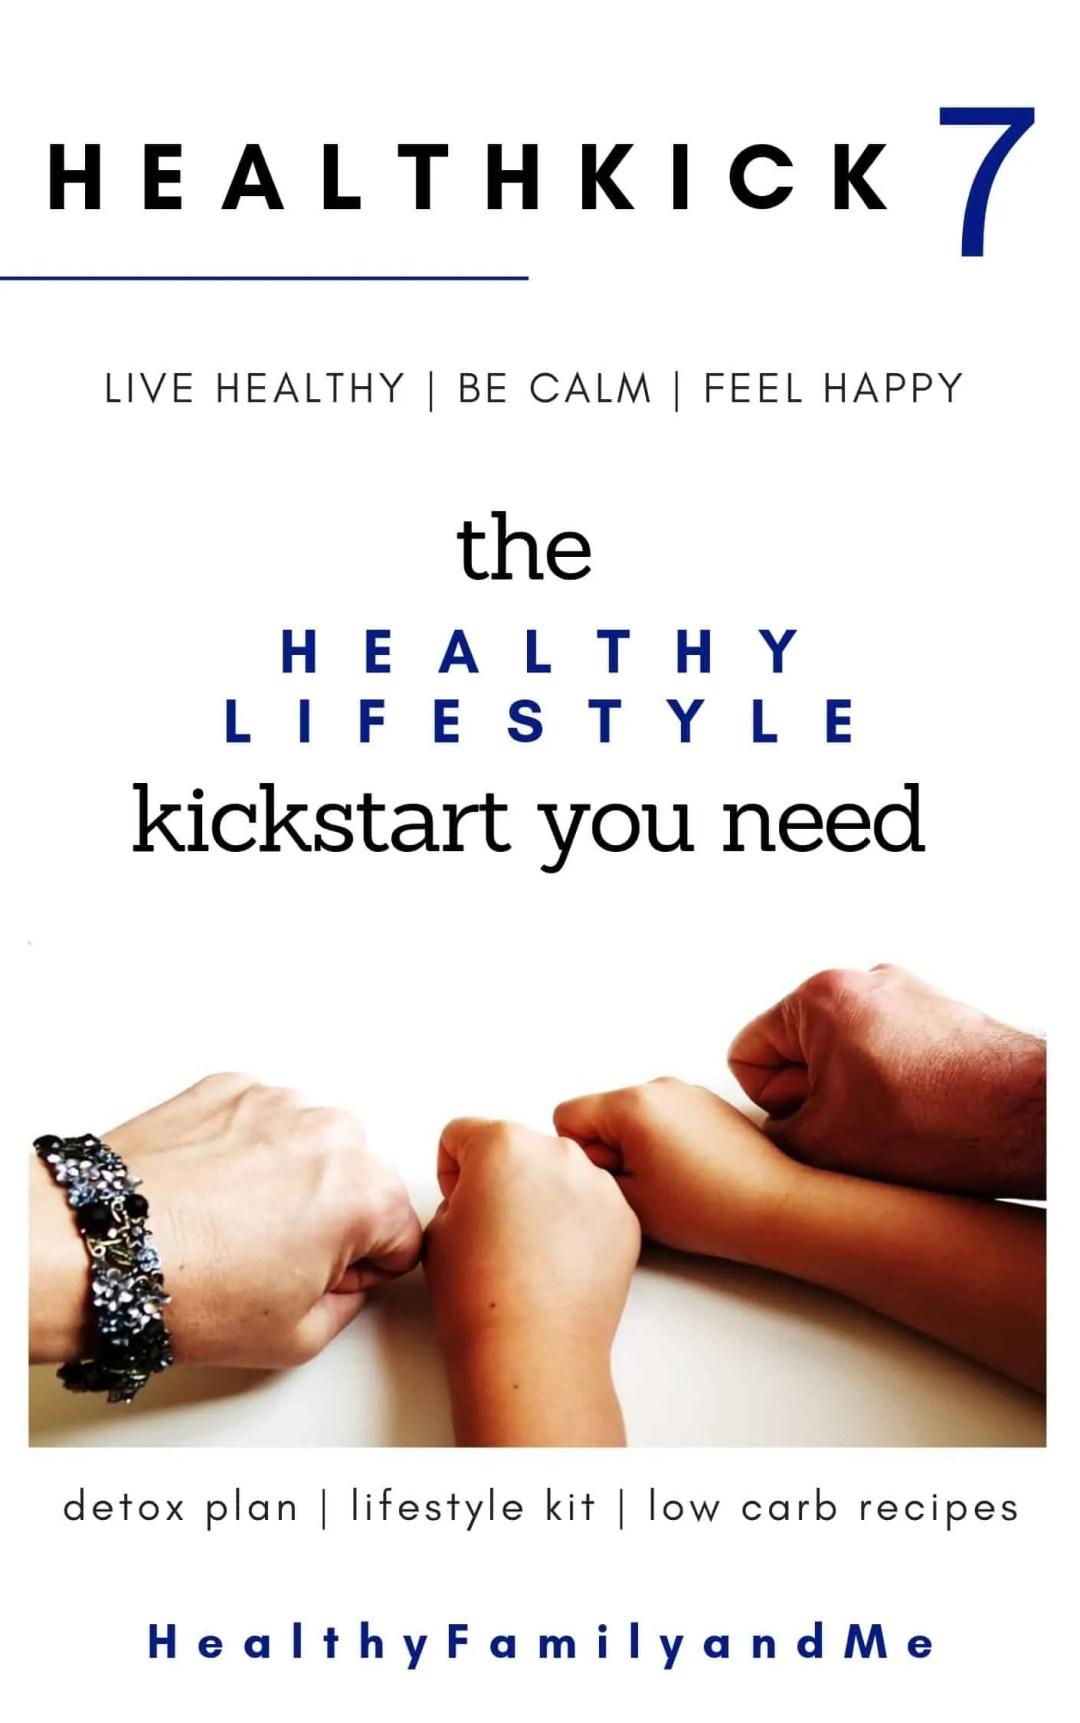 healthkick7 healthy living program